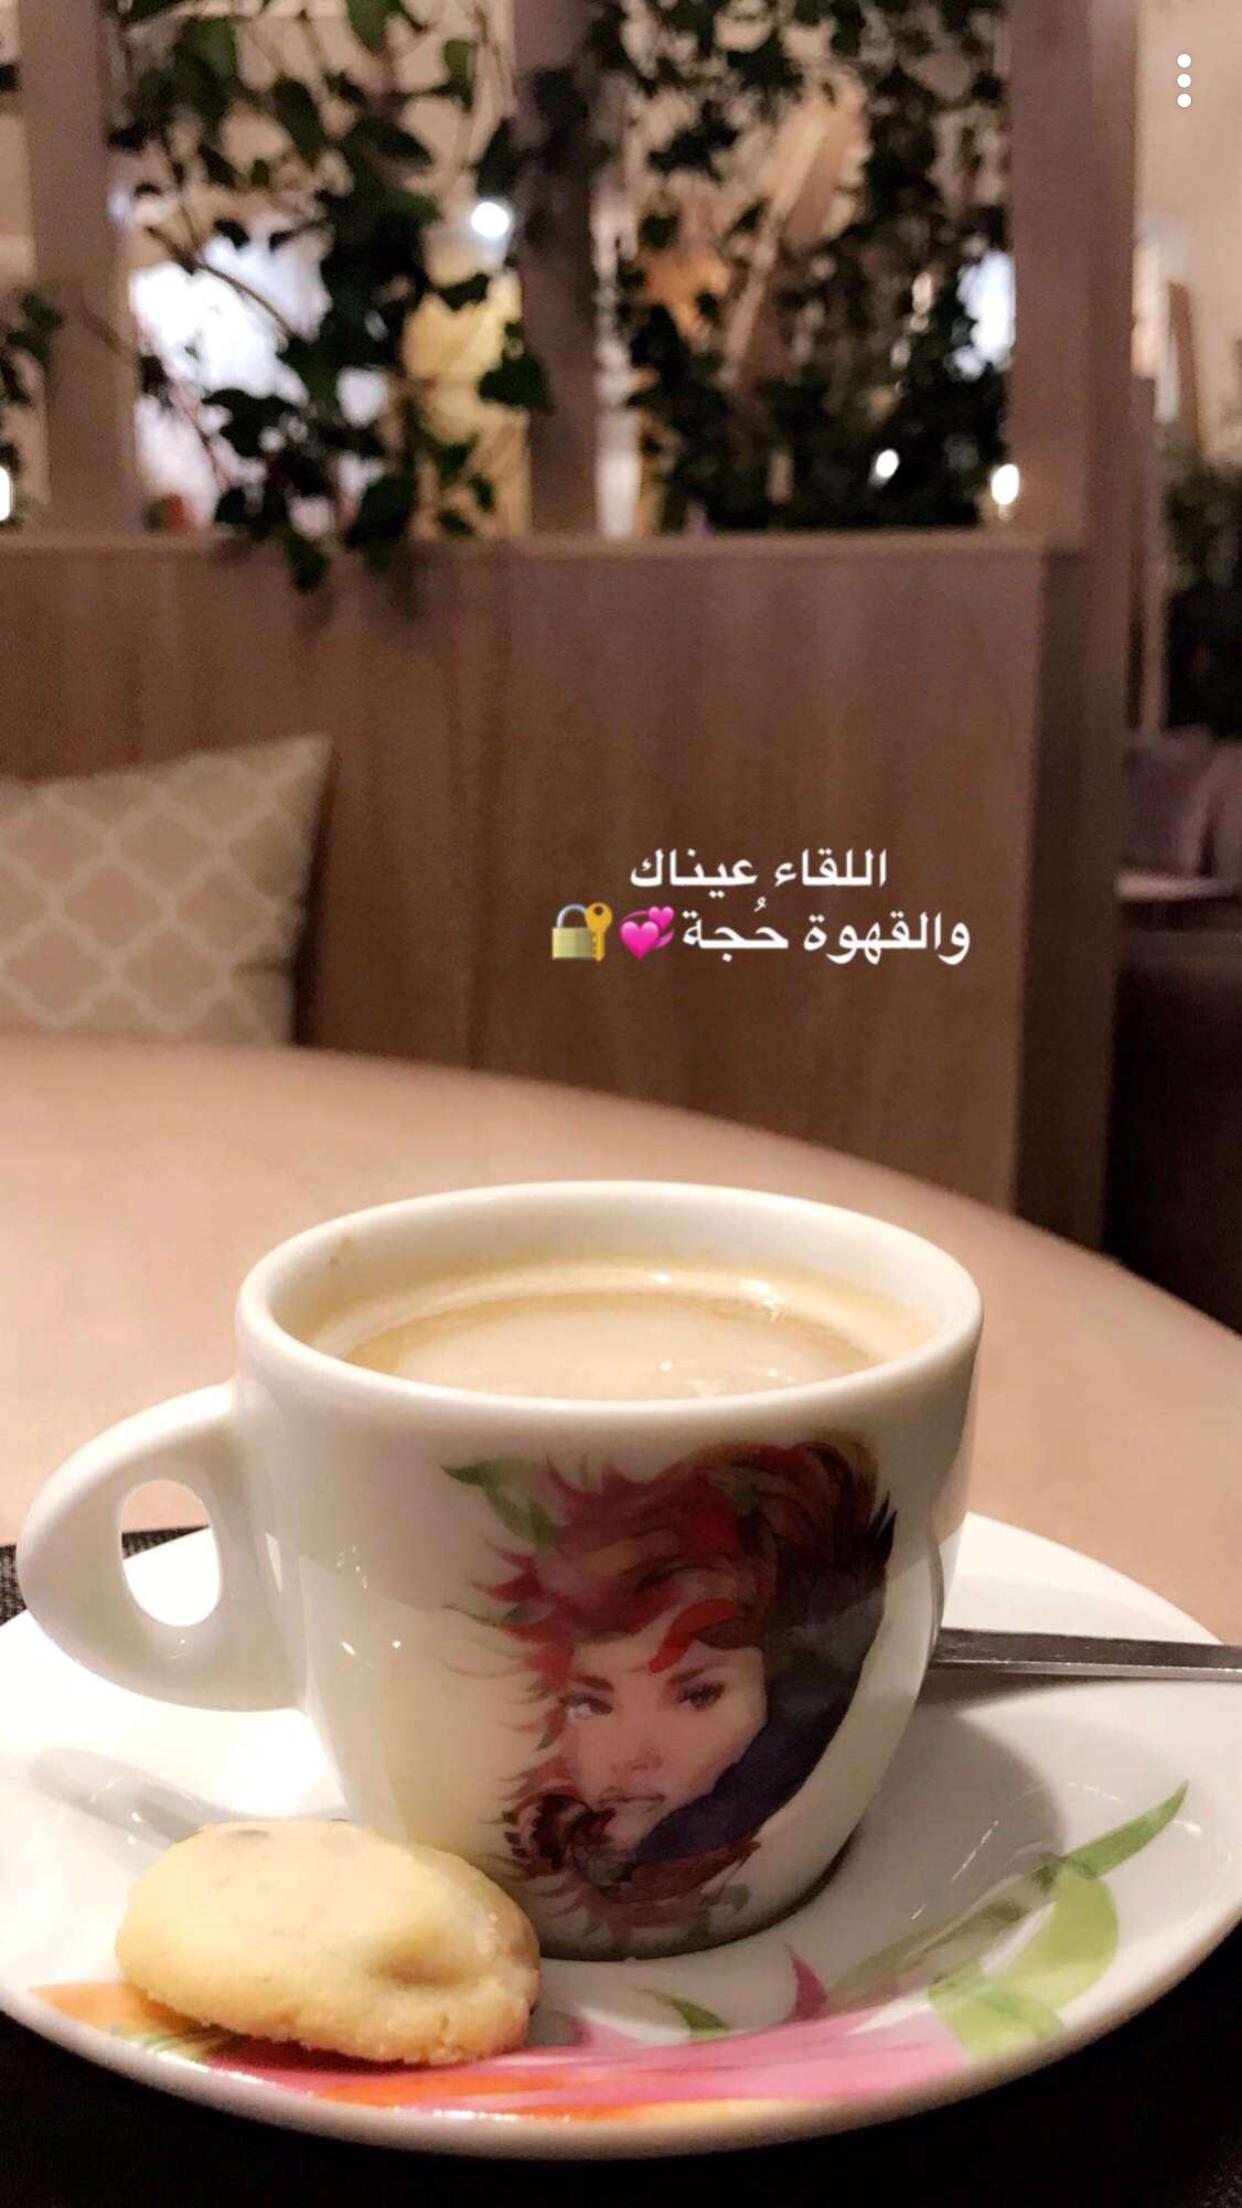 Pin By Ashwak Mohamed On شعر Coffee Shake Lovely Girl Image Glassware